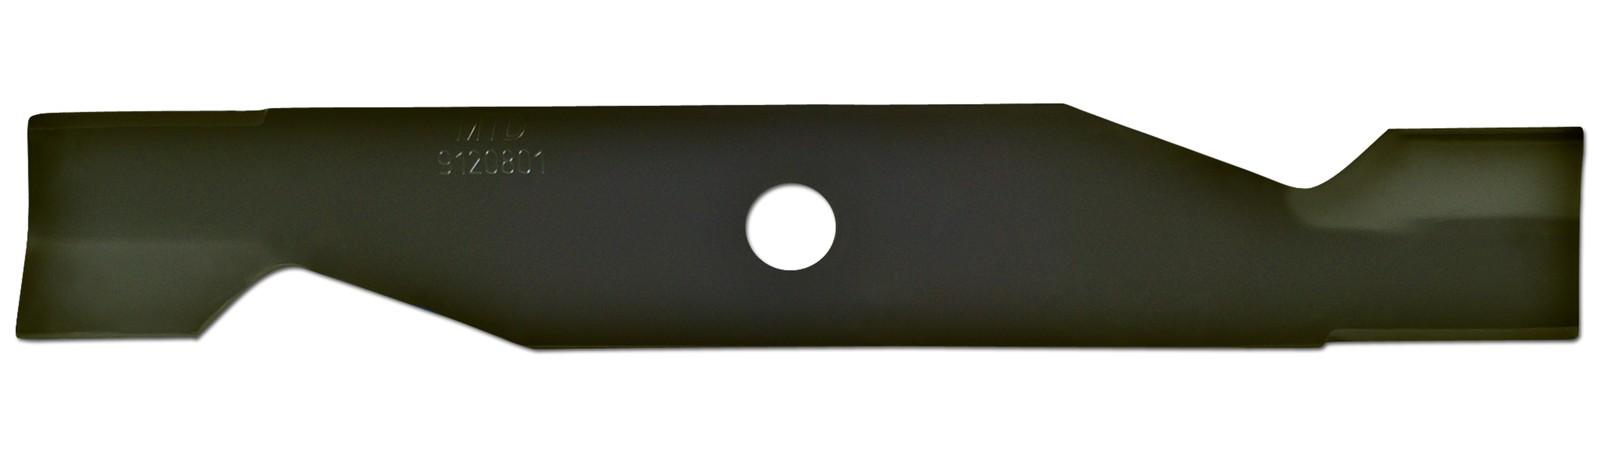 MTD Ersatzmesser für Rasenmäher MTD Mastercut SB 32cm Bild 1